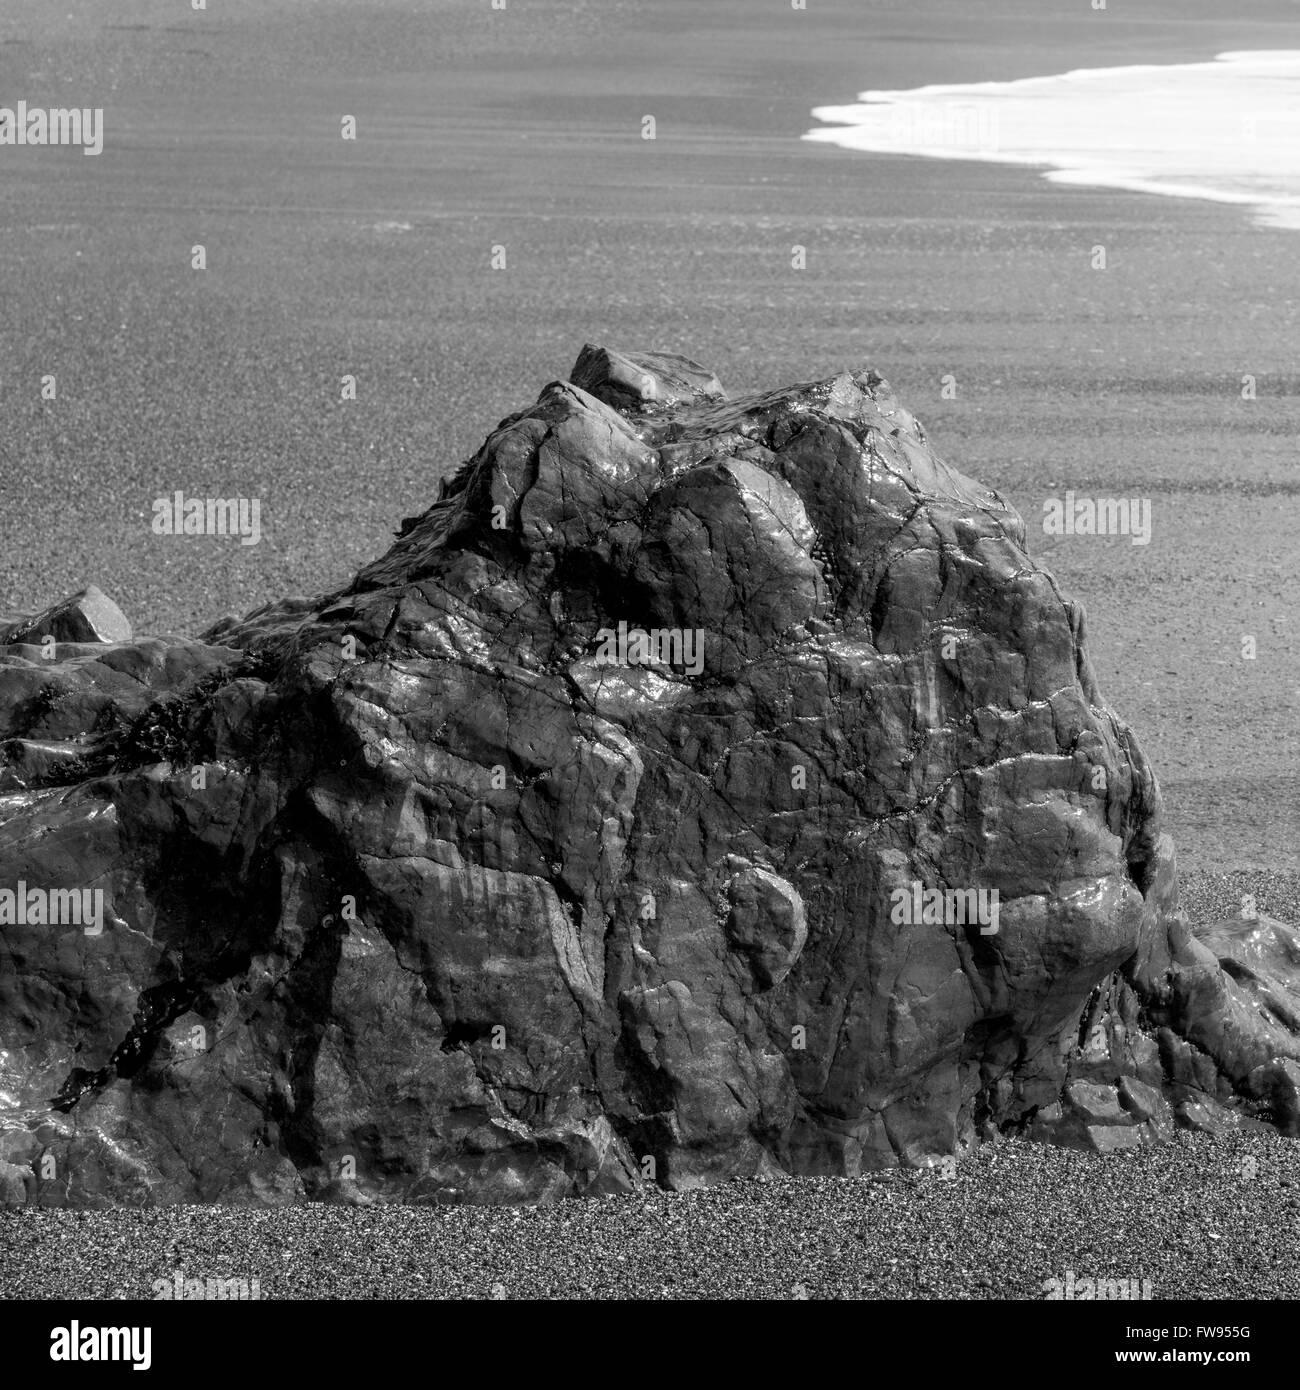 Rock formation on beach, Pacific Rim National Park Reserve, Tofino, Vancouver Island, British Columbia, Canada Stock Photo